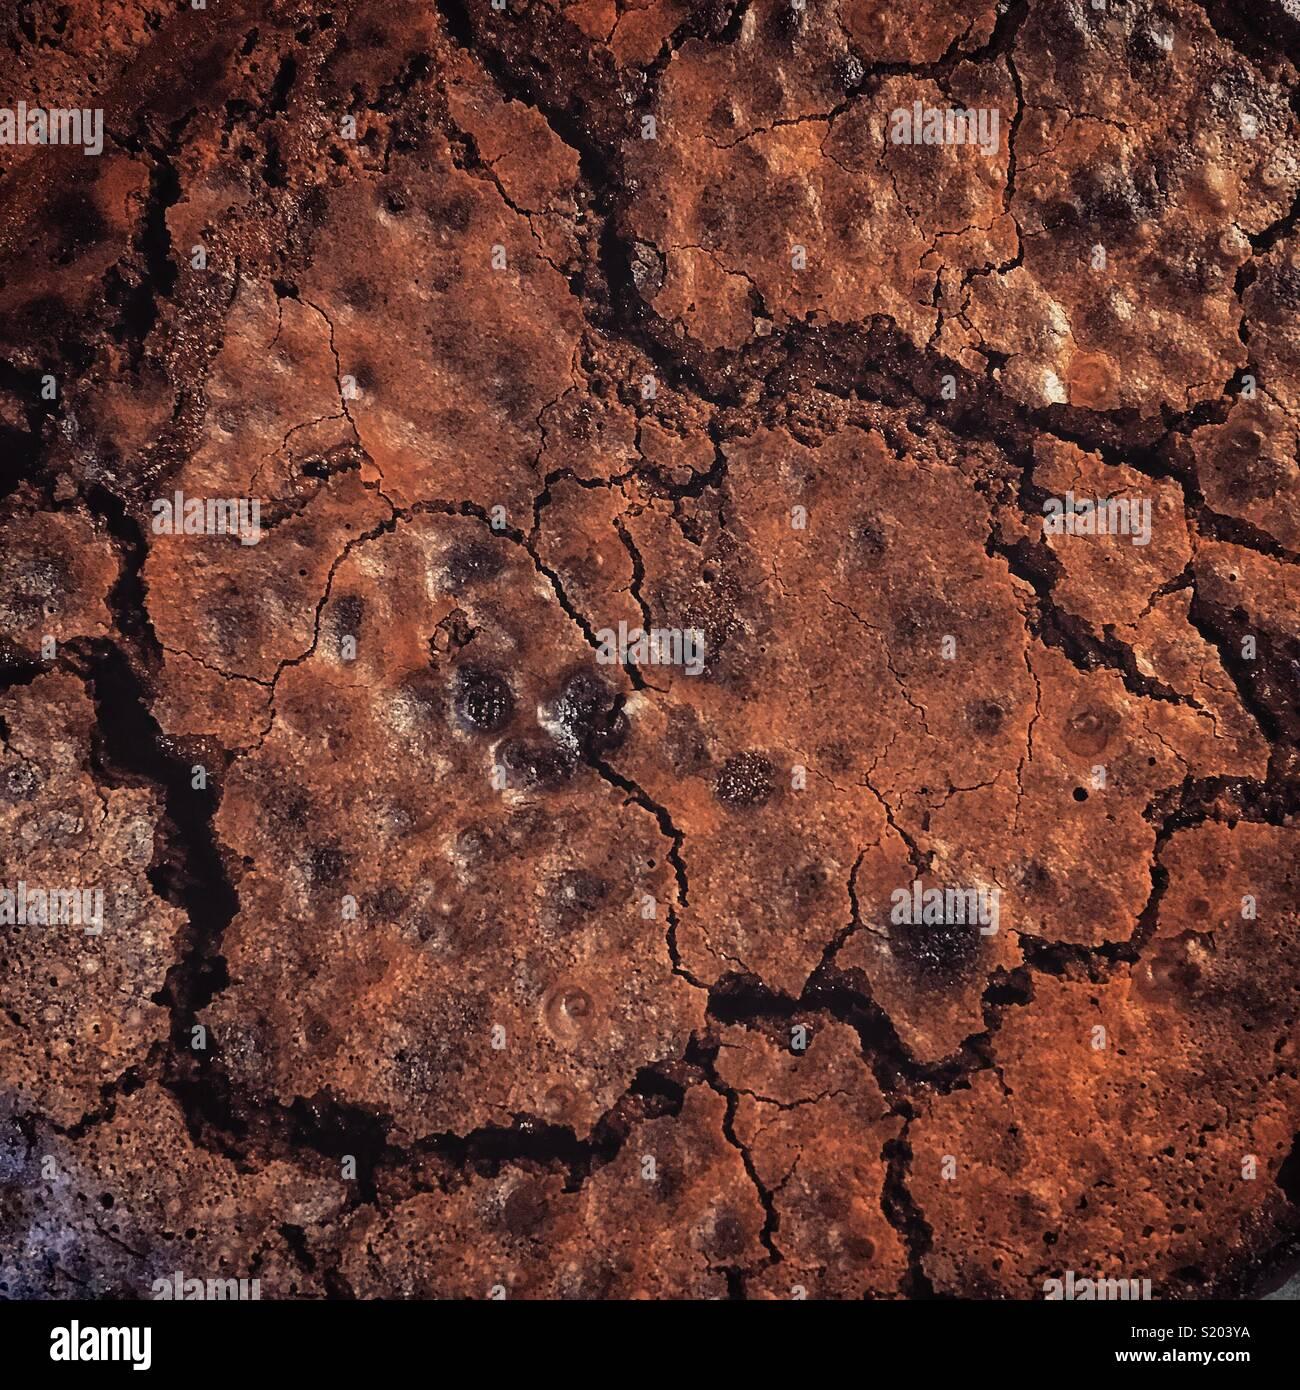 Chocolate brownie - Stock Image